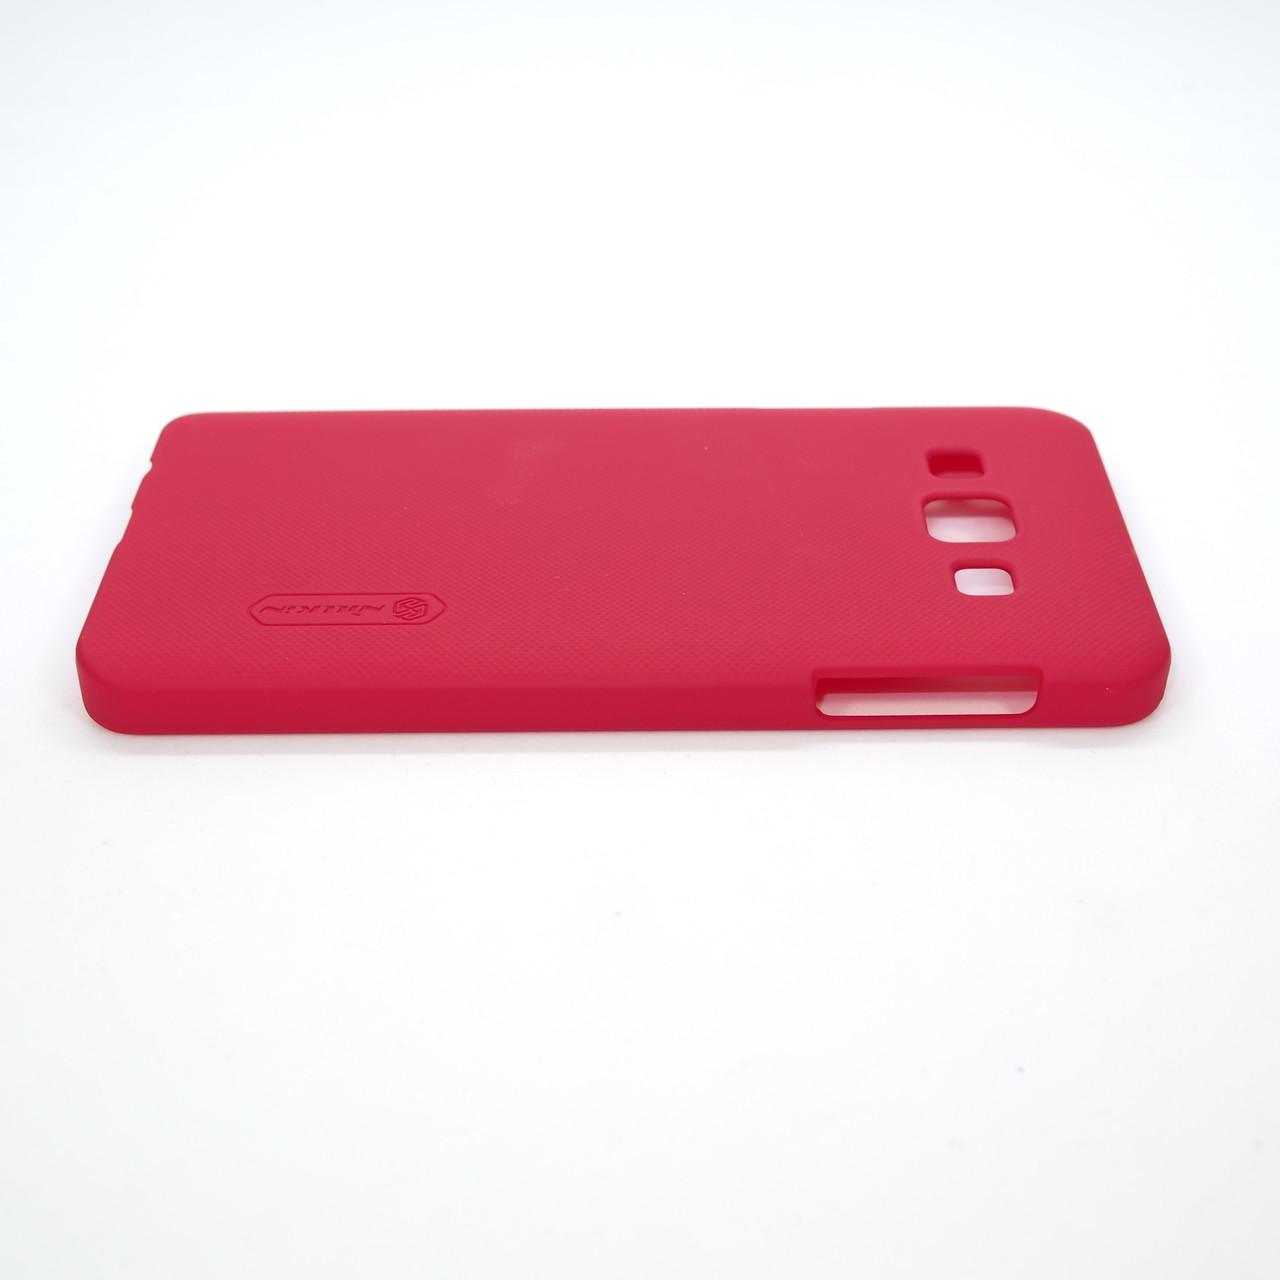 Чехлы для Galaxy A Series (остальные модели) Nillkin Super Frosted Shield Samsung A3 red